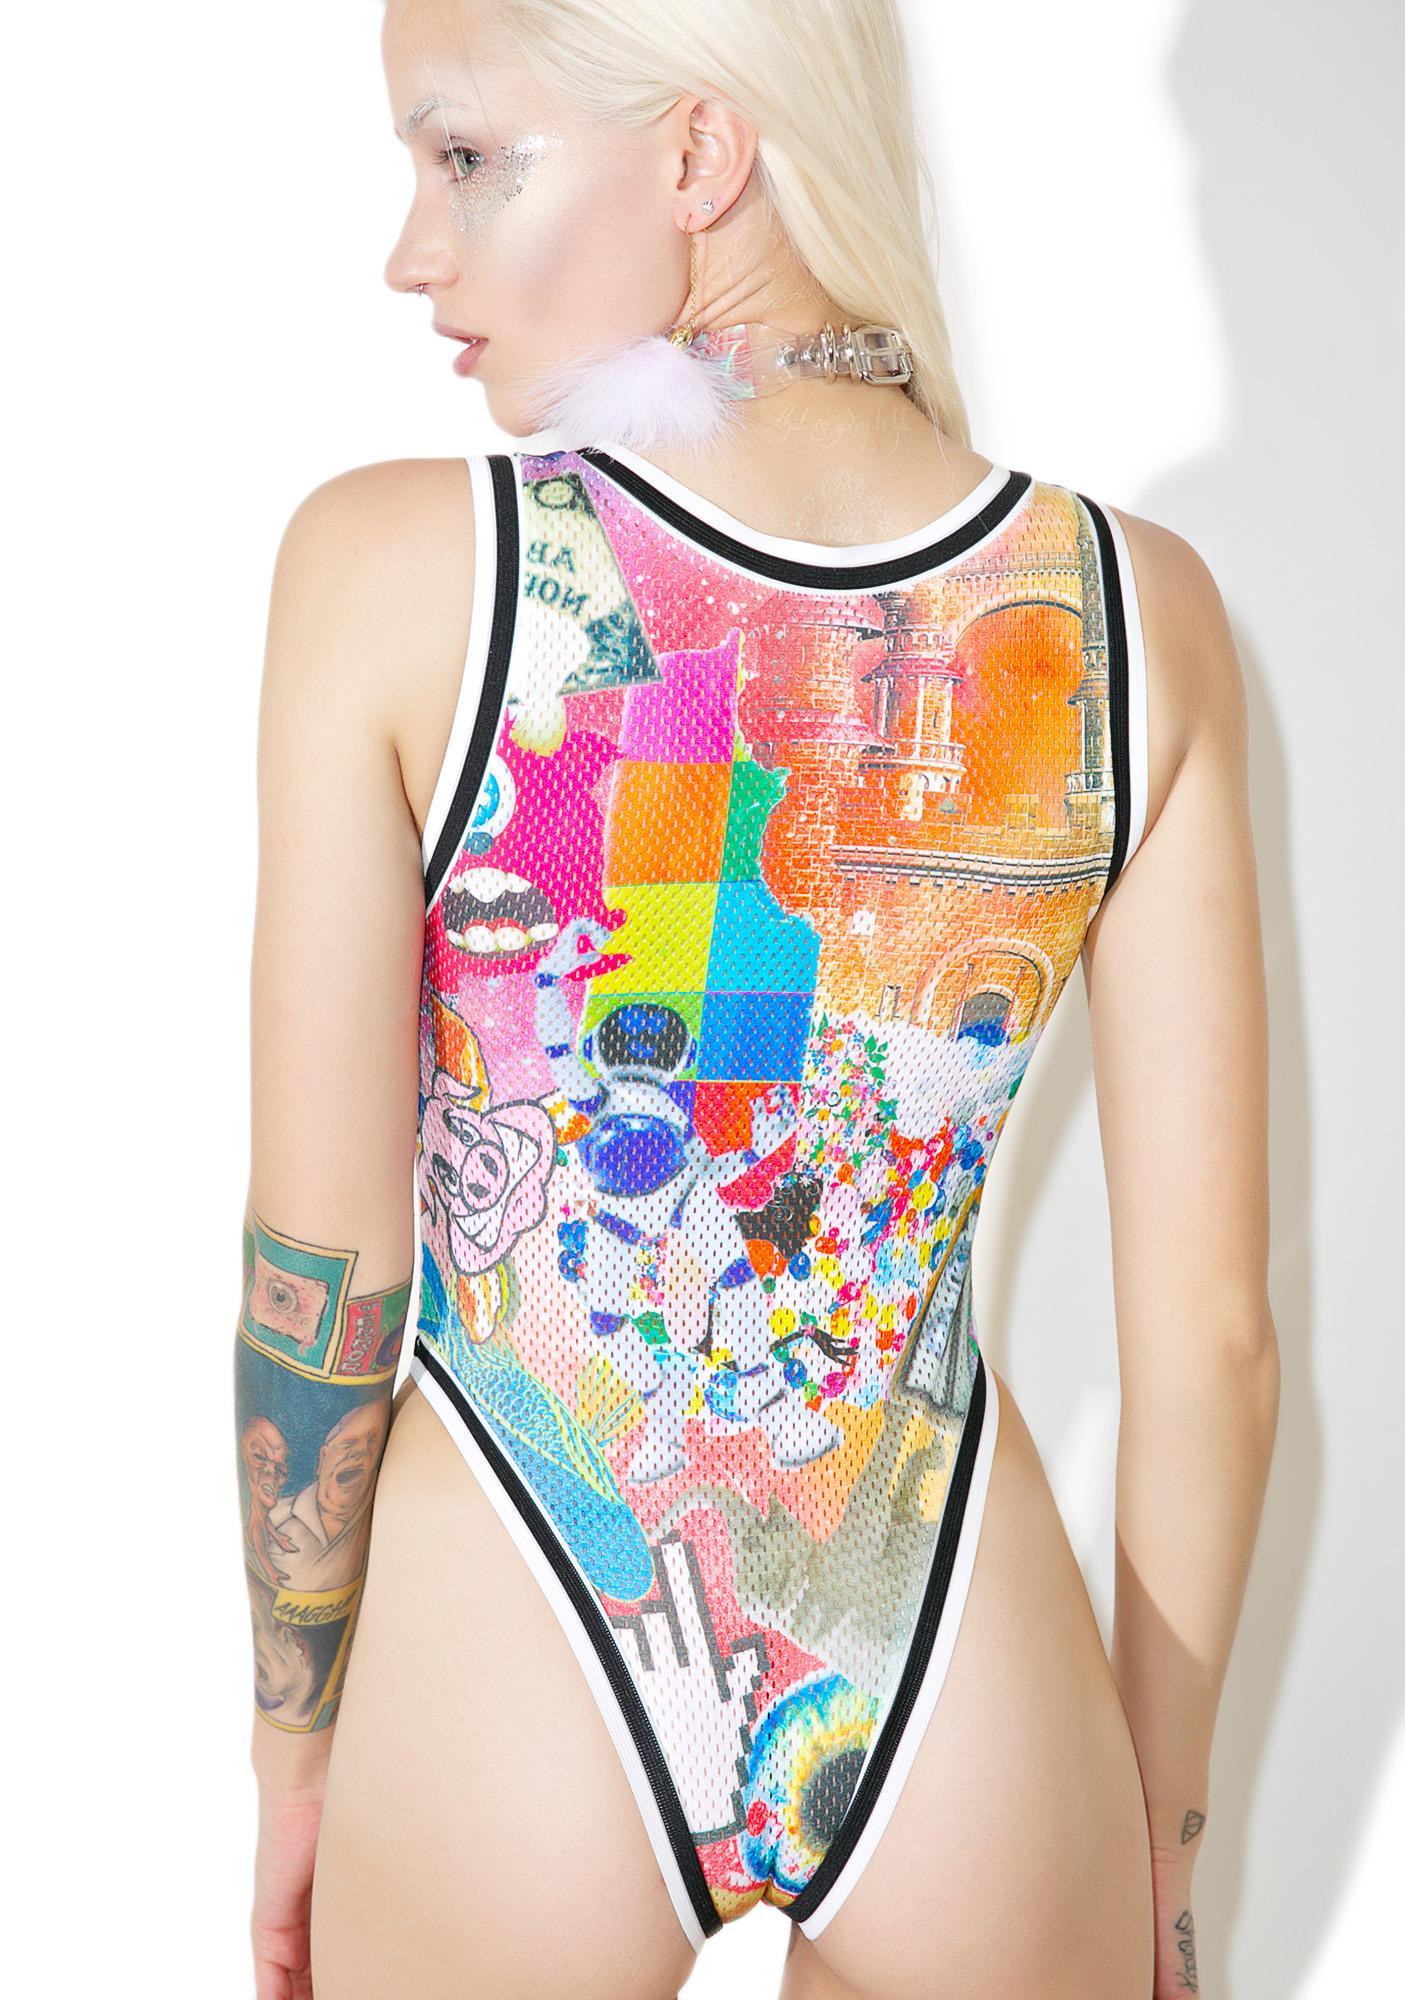 Who Cares NYC? Da High Lyfe Graphic Bodysuit